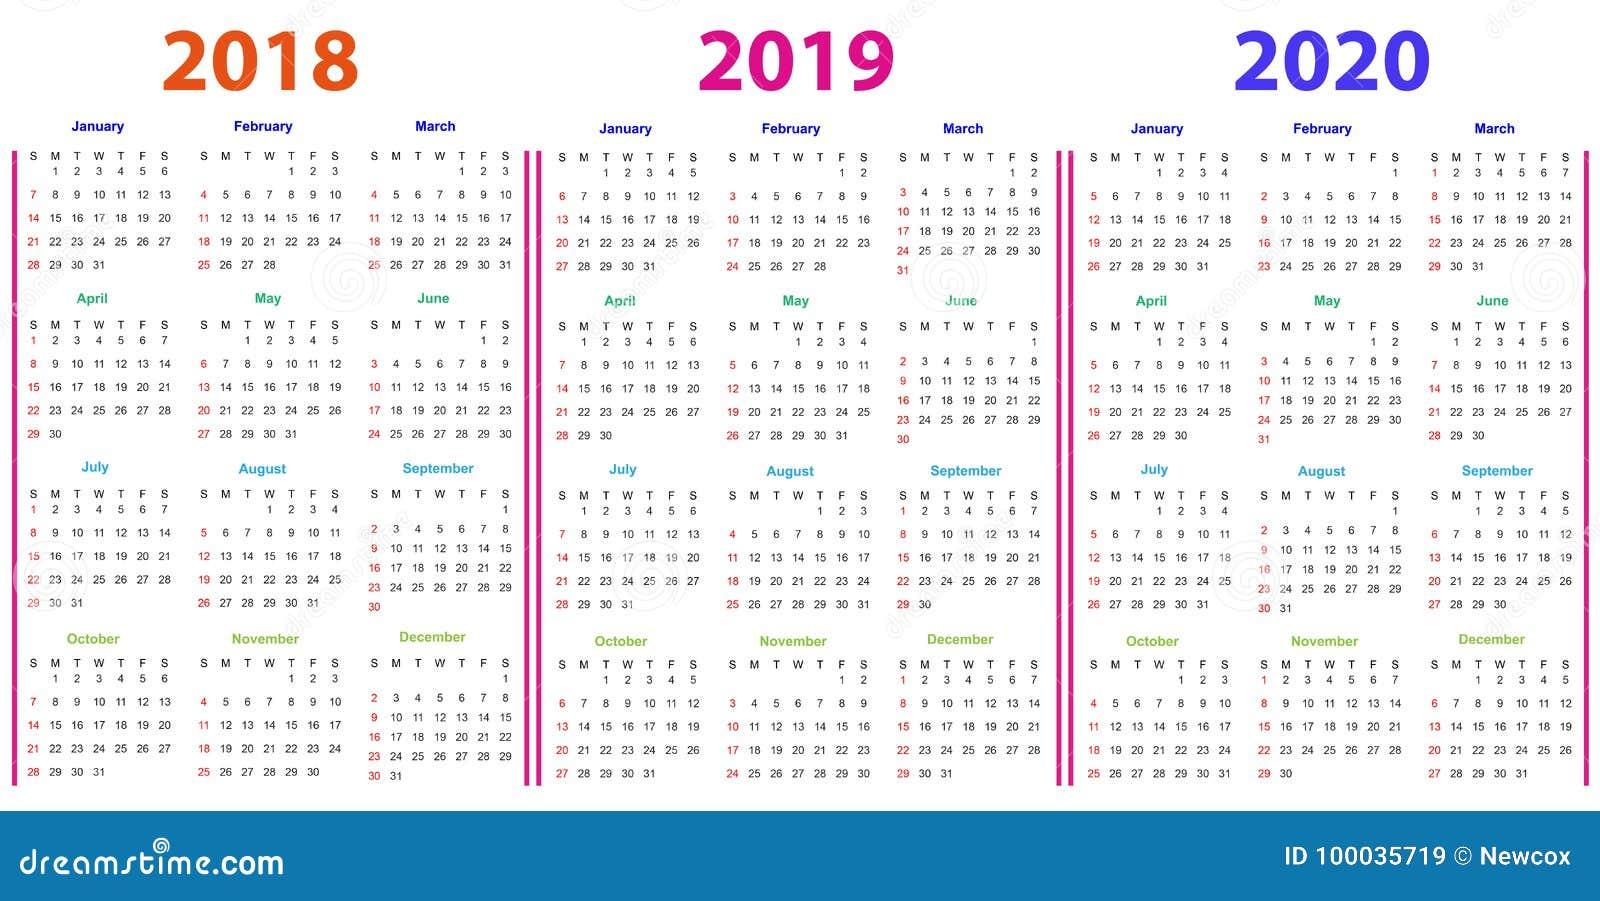 12 months calendar design 2018 2019 2020 stock vector illustration